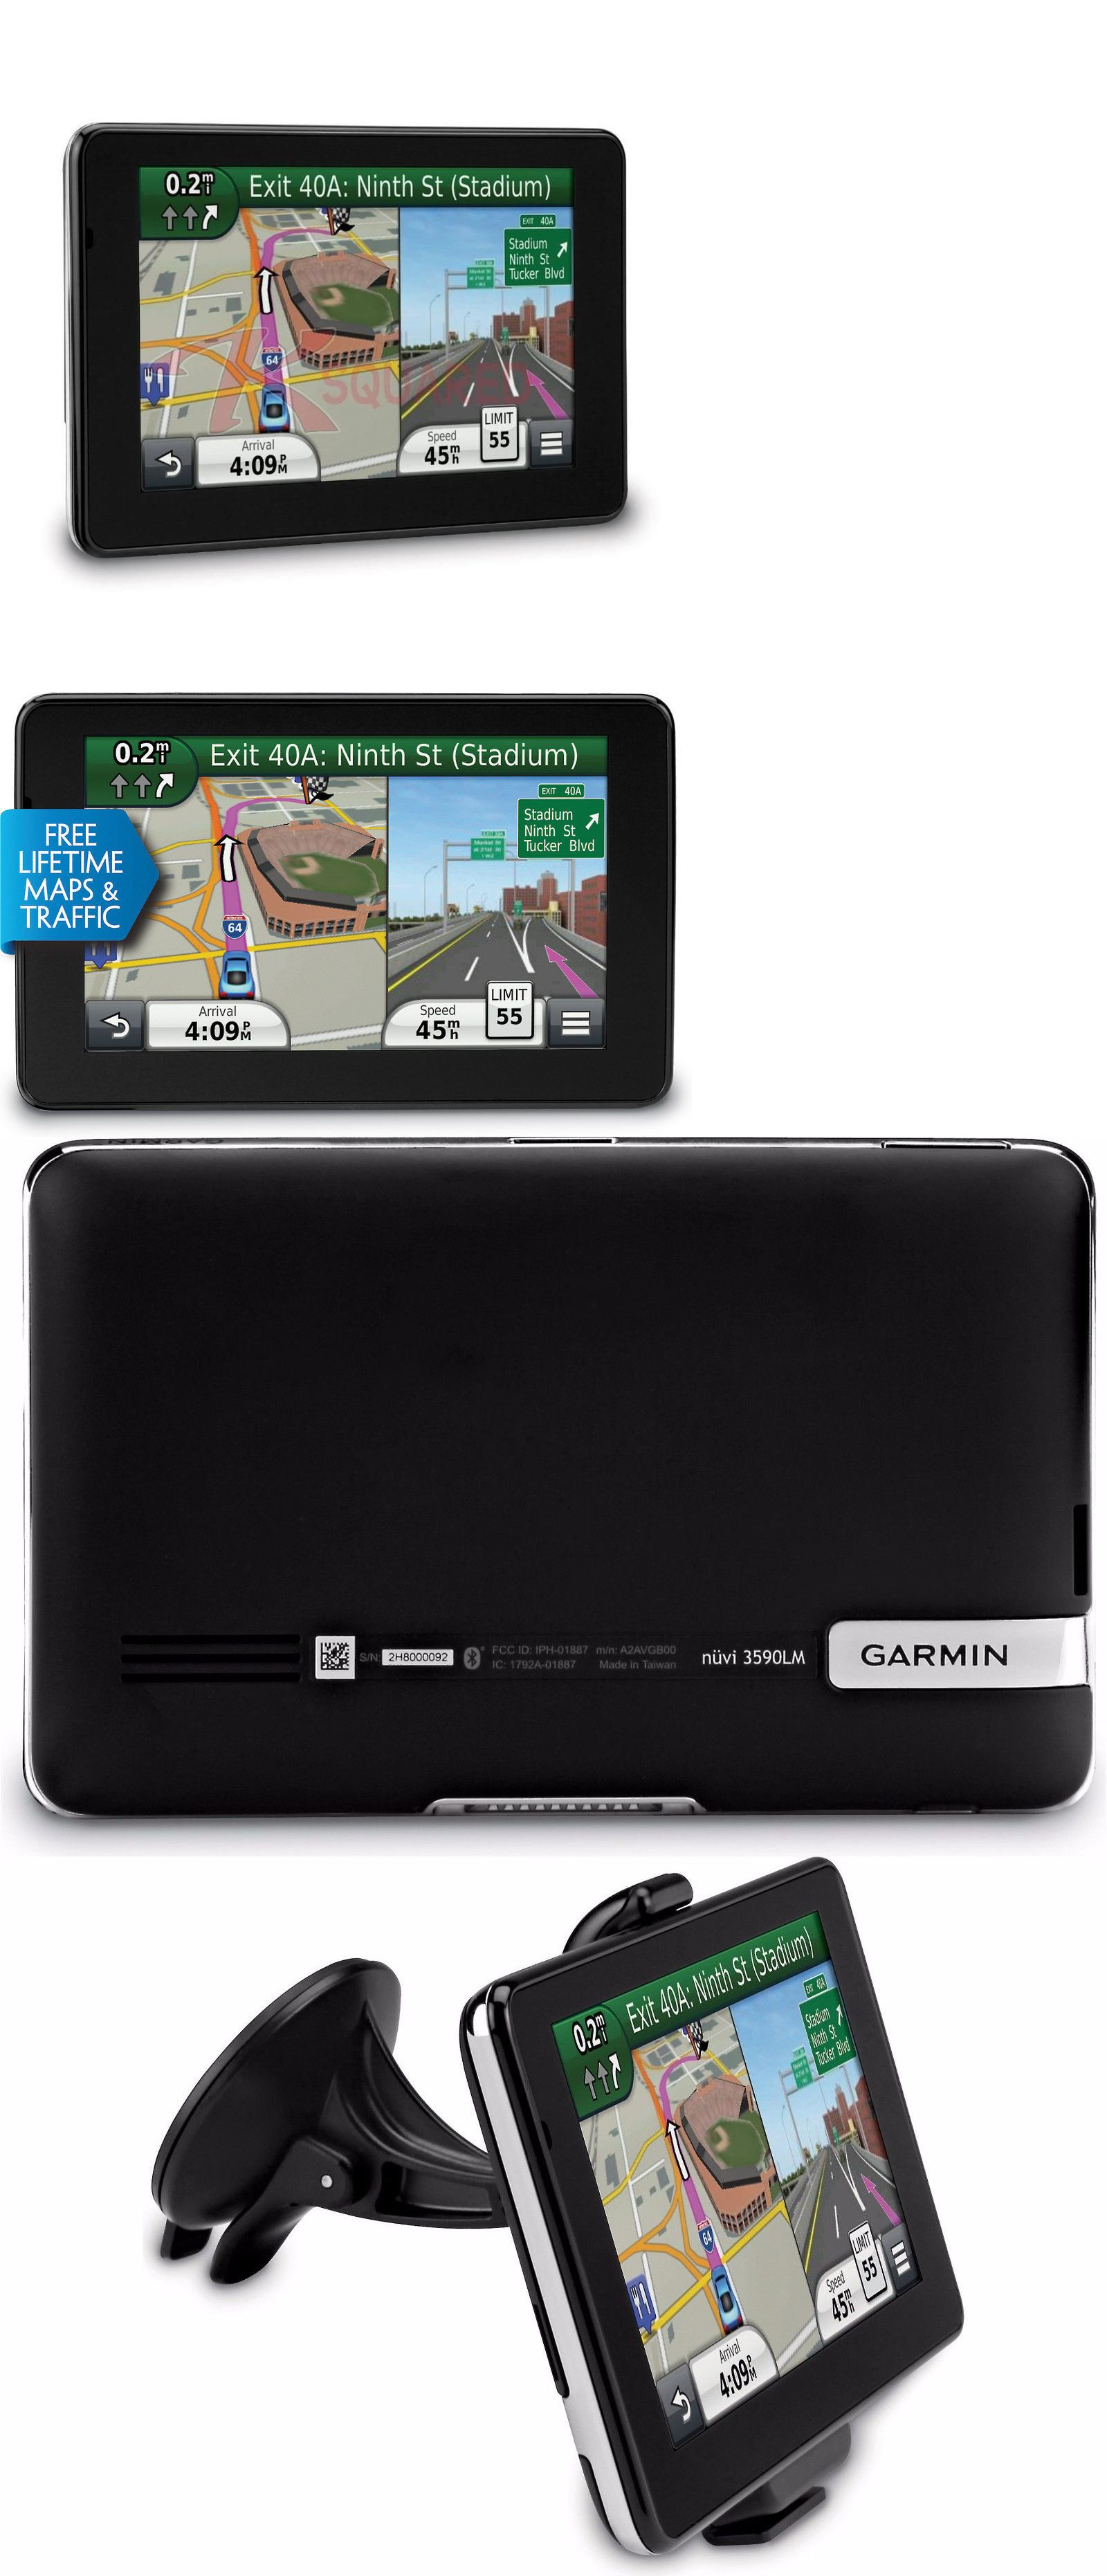 GPS Units Garmin Nuvi 3590Lmt Automotive Gps Receiver 5 Touchscreen Bluetooth BUY IT